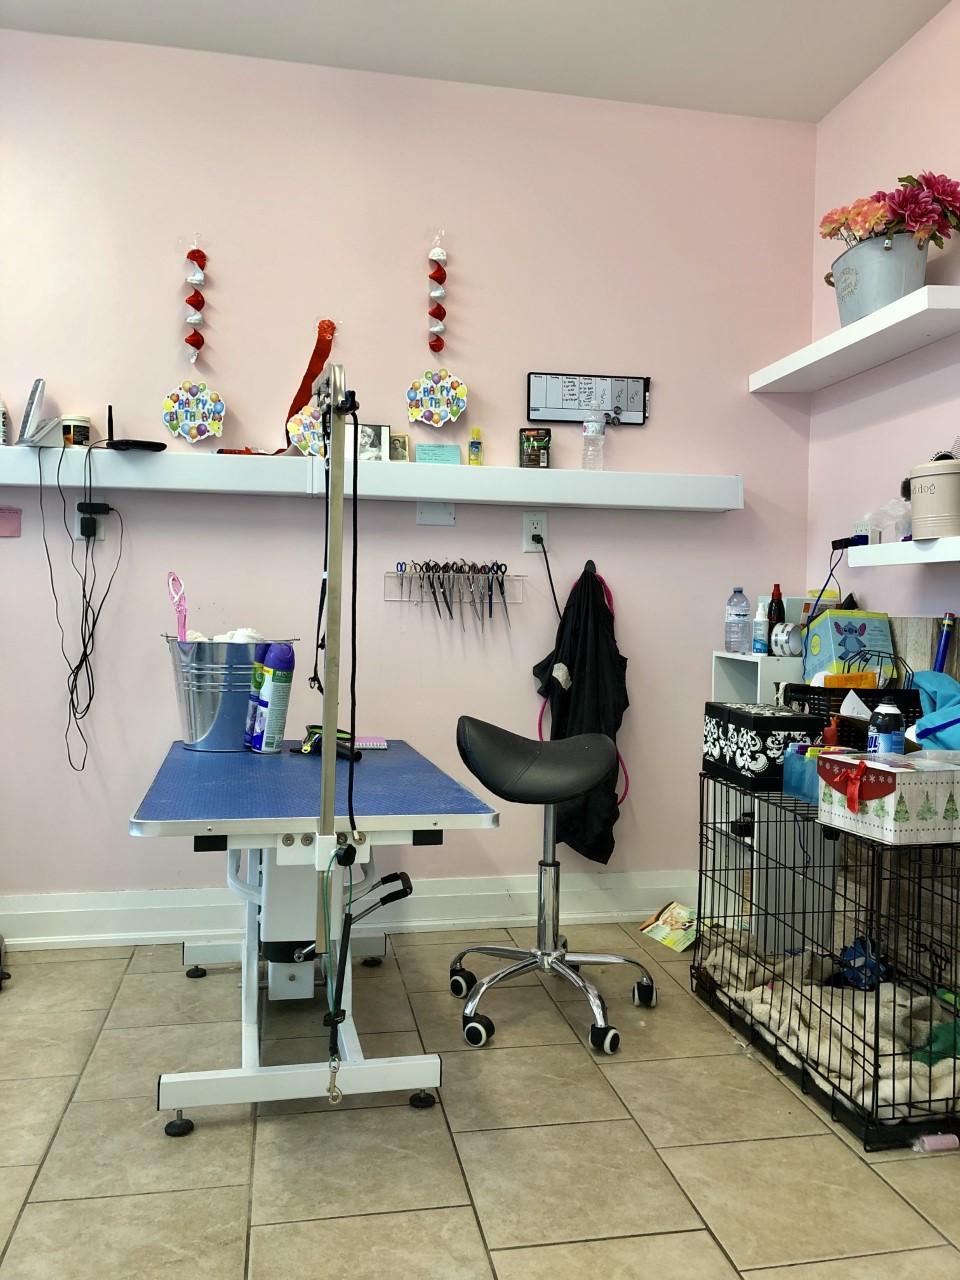 Bright Pets | pet store | 15 Chapel St, Bolton, ON L7E 1C2, Canada | 9059516572 OR +1 905-951-6572